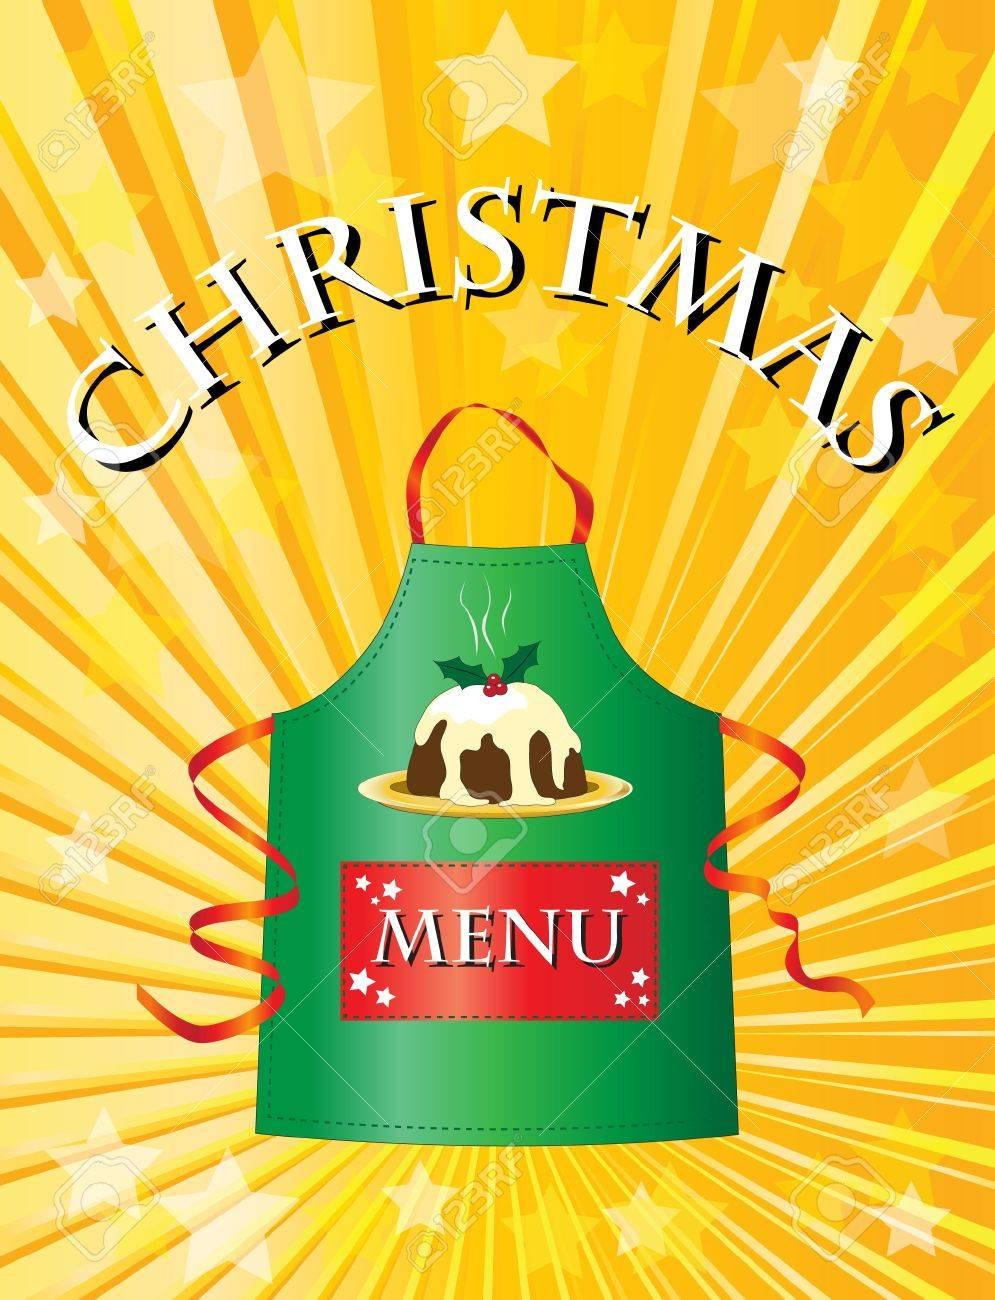 A menu template for a Christmas menu. Stock Vector - 11031806